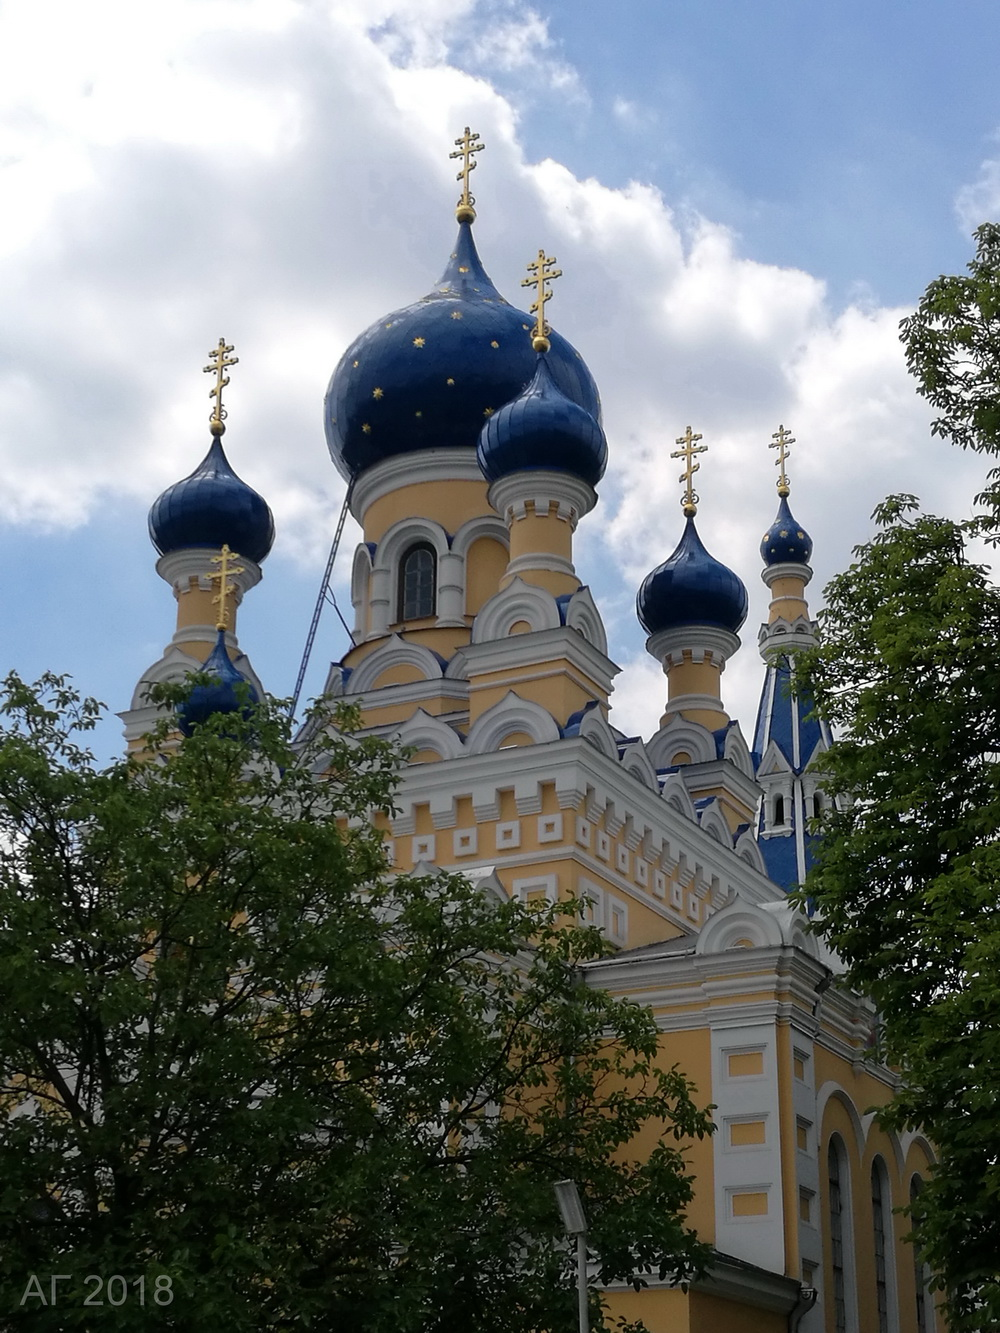 Церковь Святого Николая Чудотворца, Брест, 21.06.2018